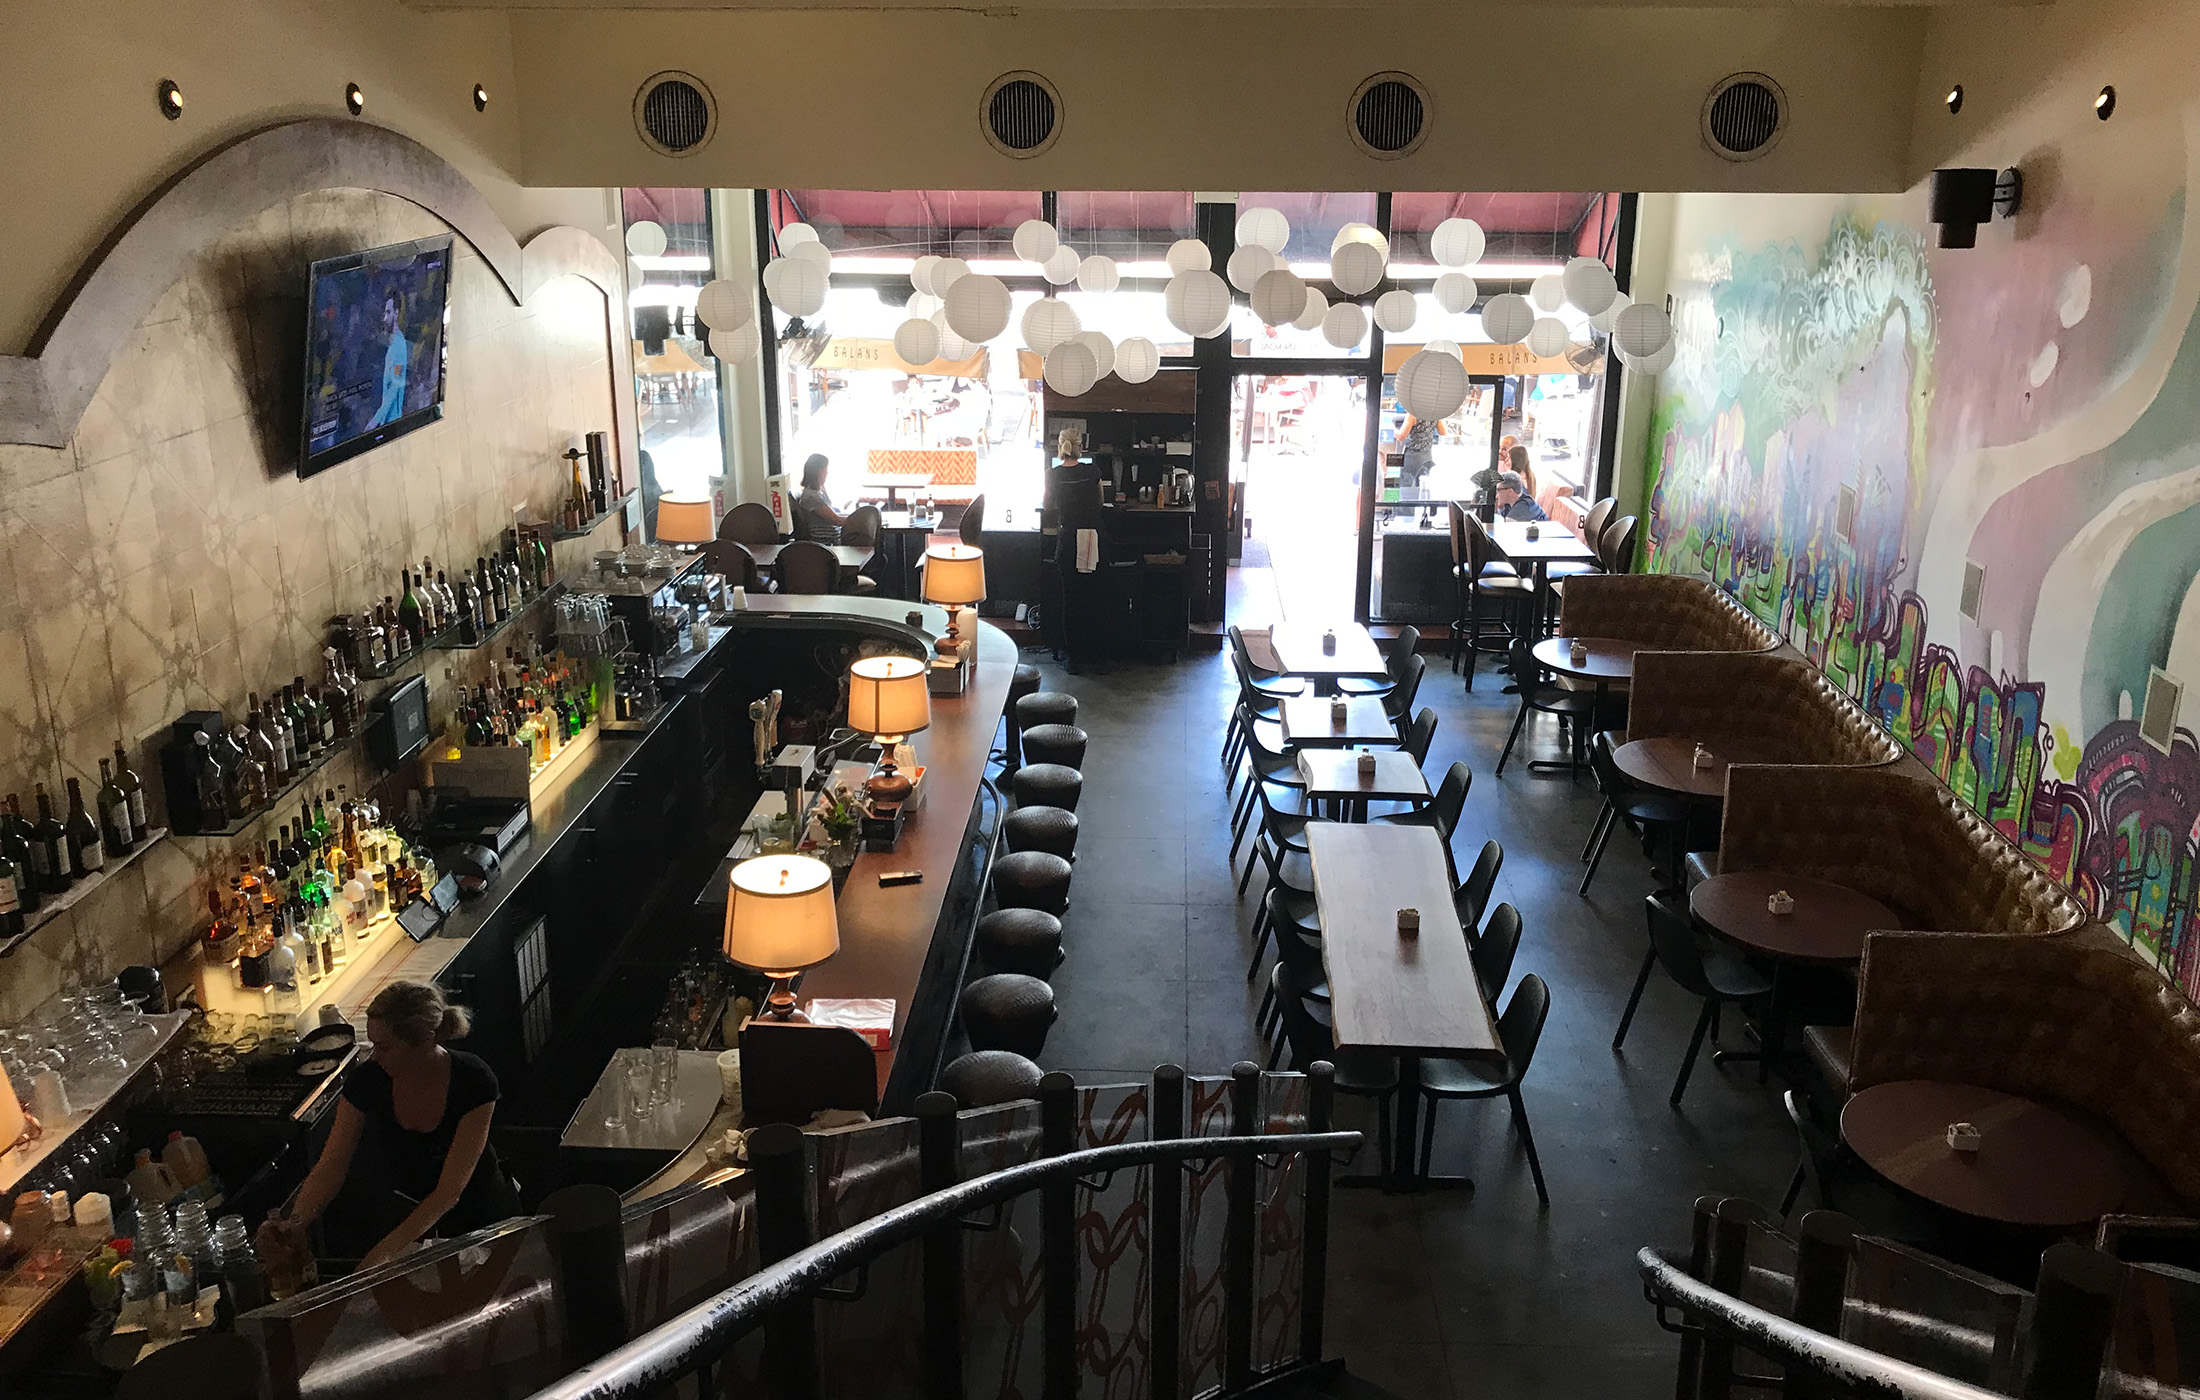 Lincoln Road BID restaurant